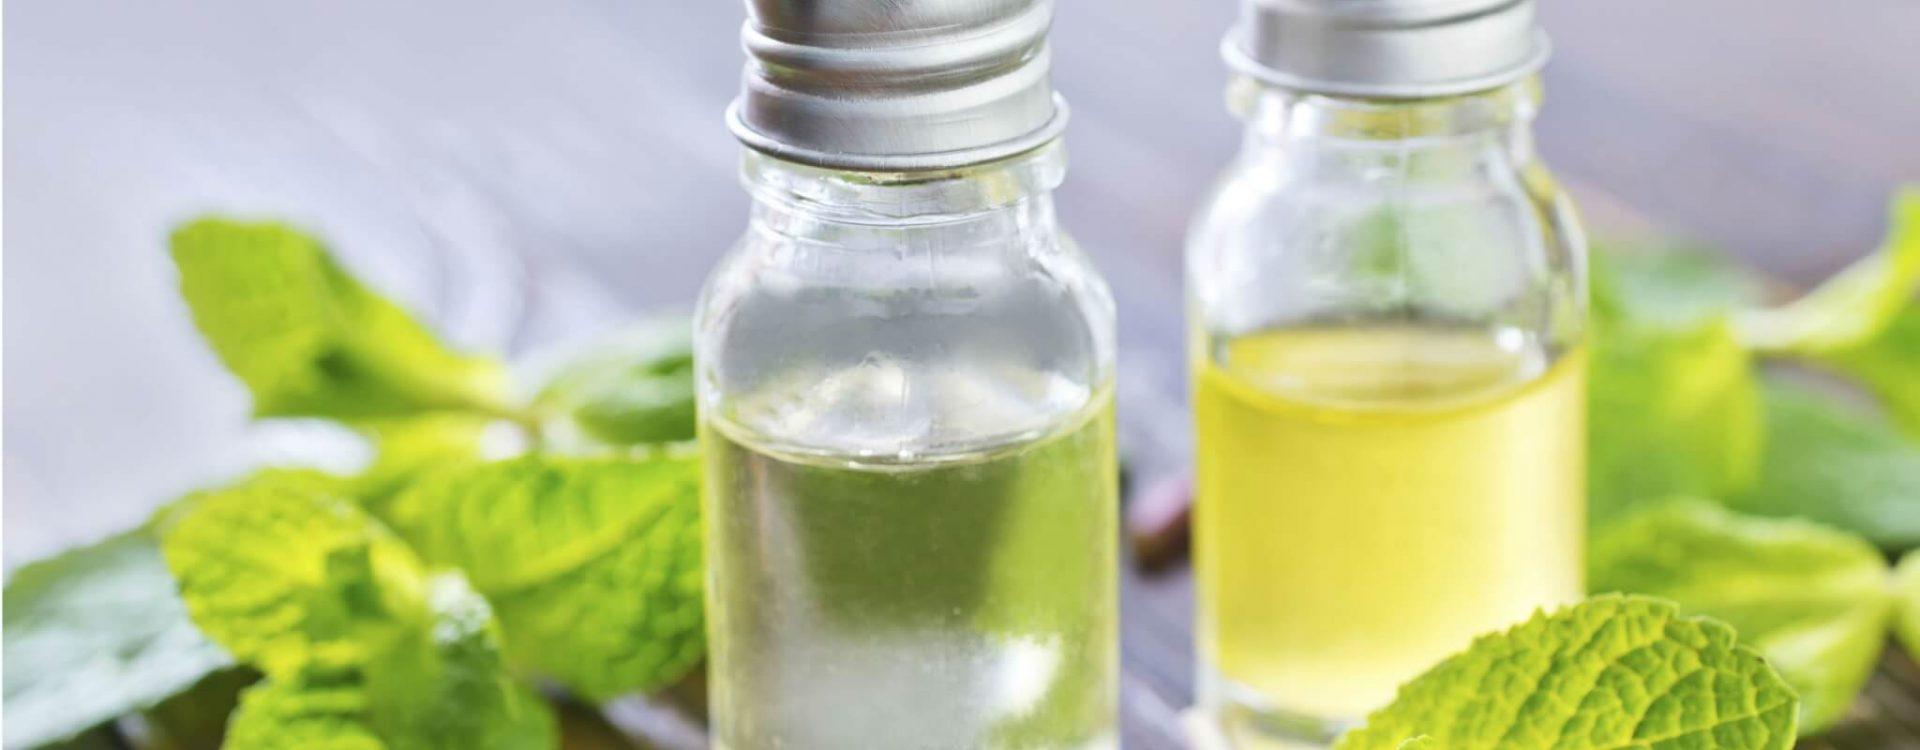 Vietnamese mint oil